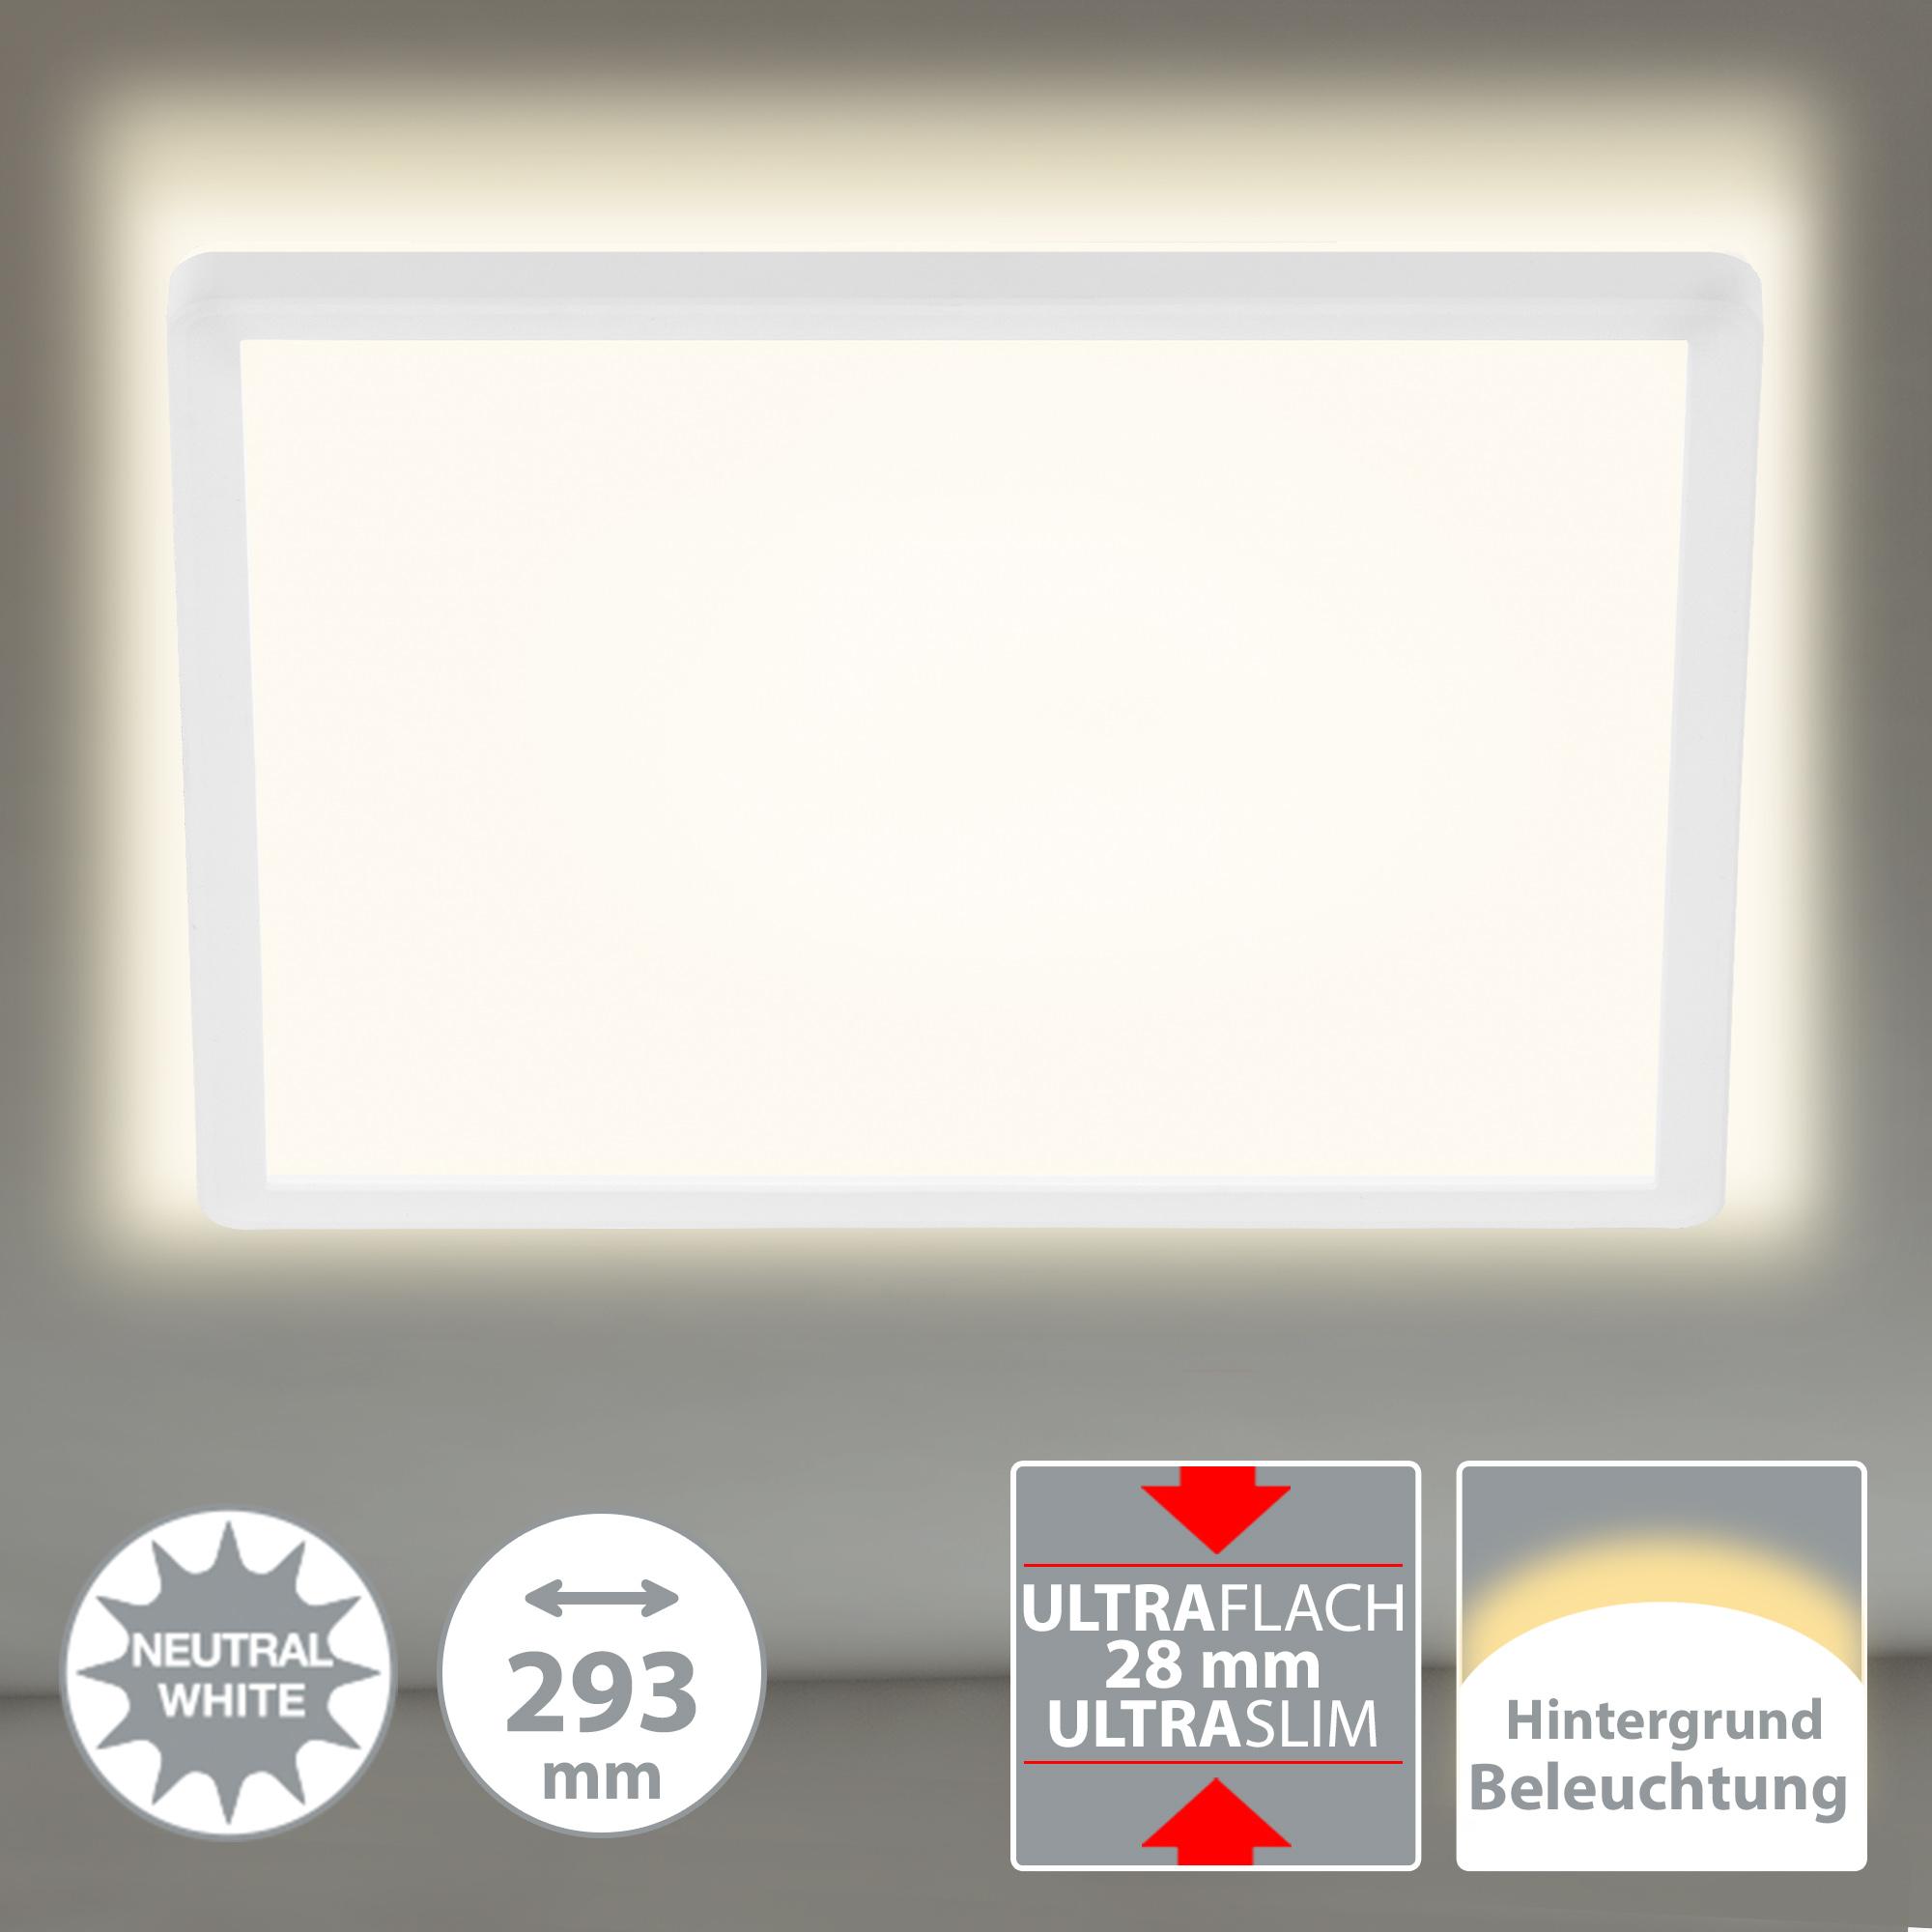 SLIM LED Panel, 29,3 cm, 2400 LUMEN, 18 WATT, Weiß